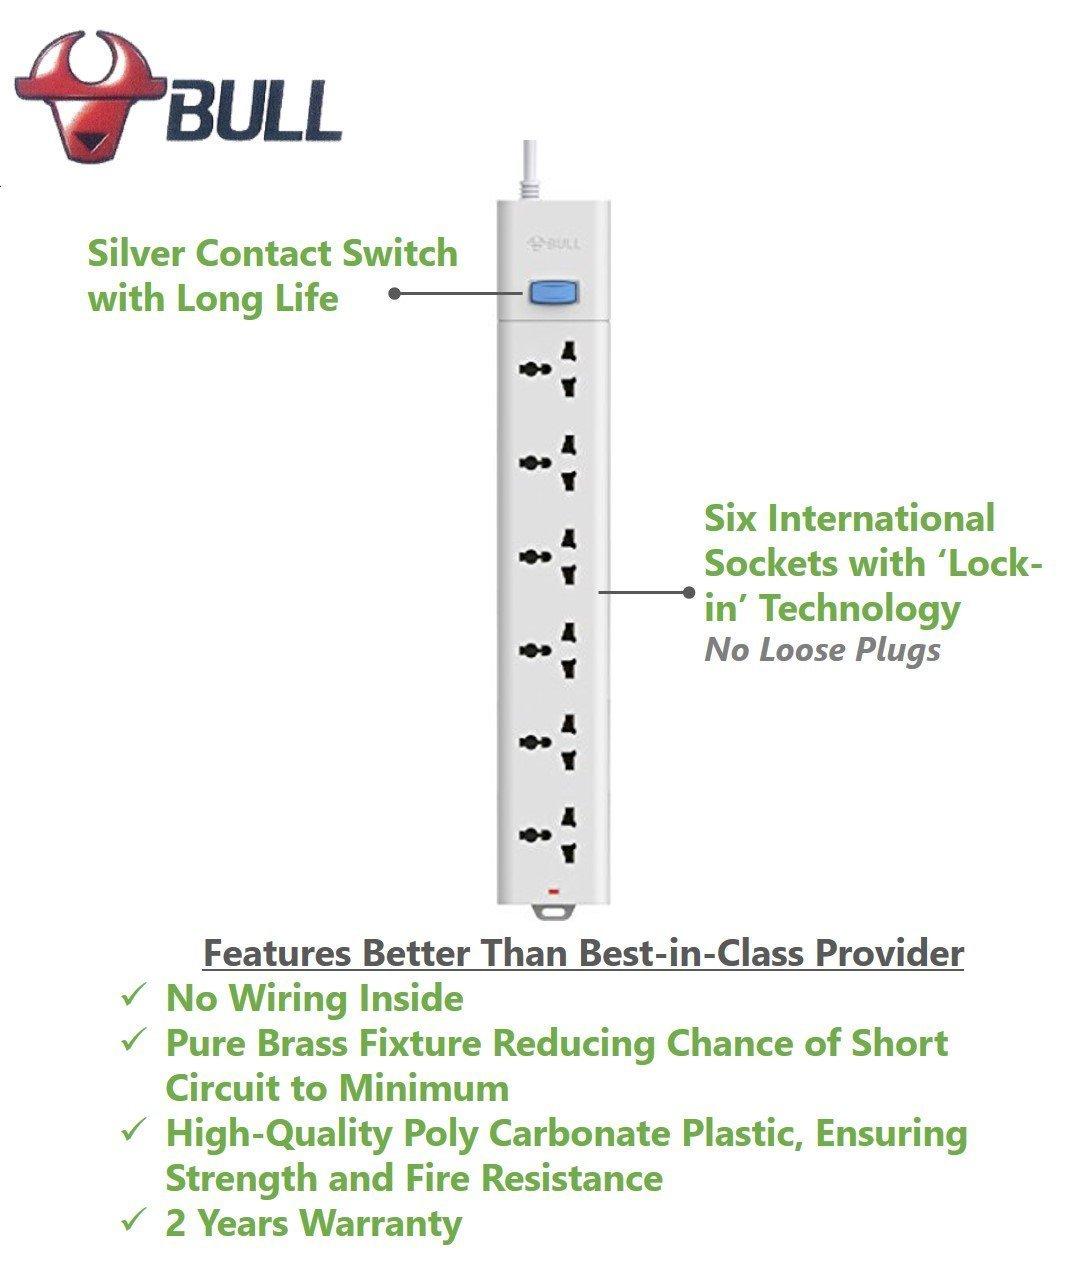 Gongniu (Formerly Bull) Extension Board; 6 Socket, 1 Switch, 3 M Wire